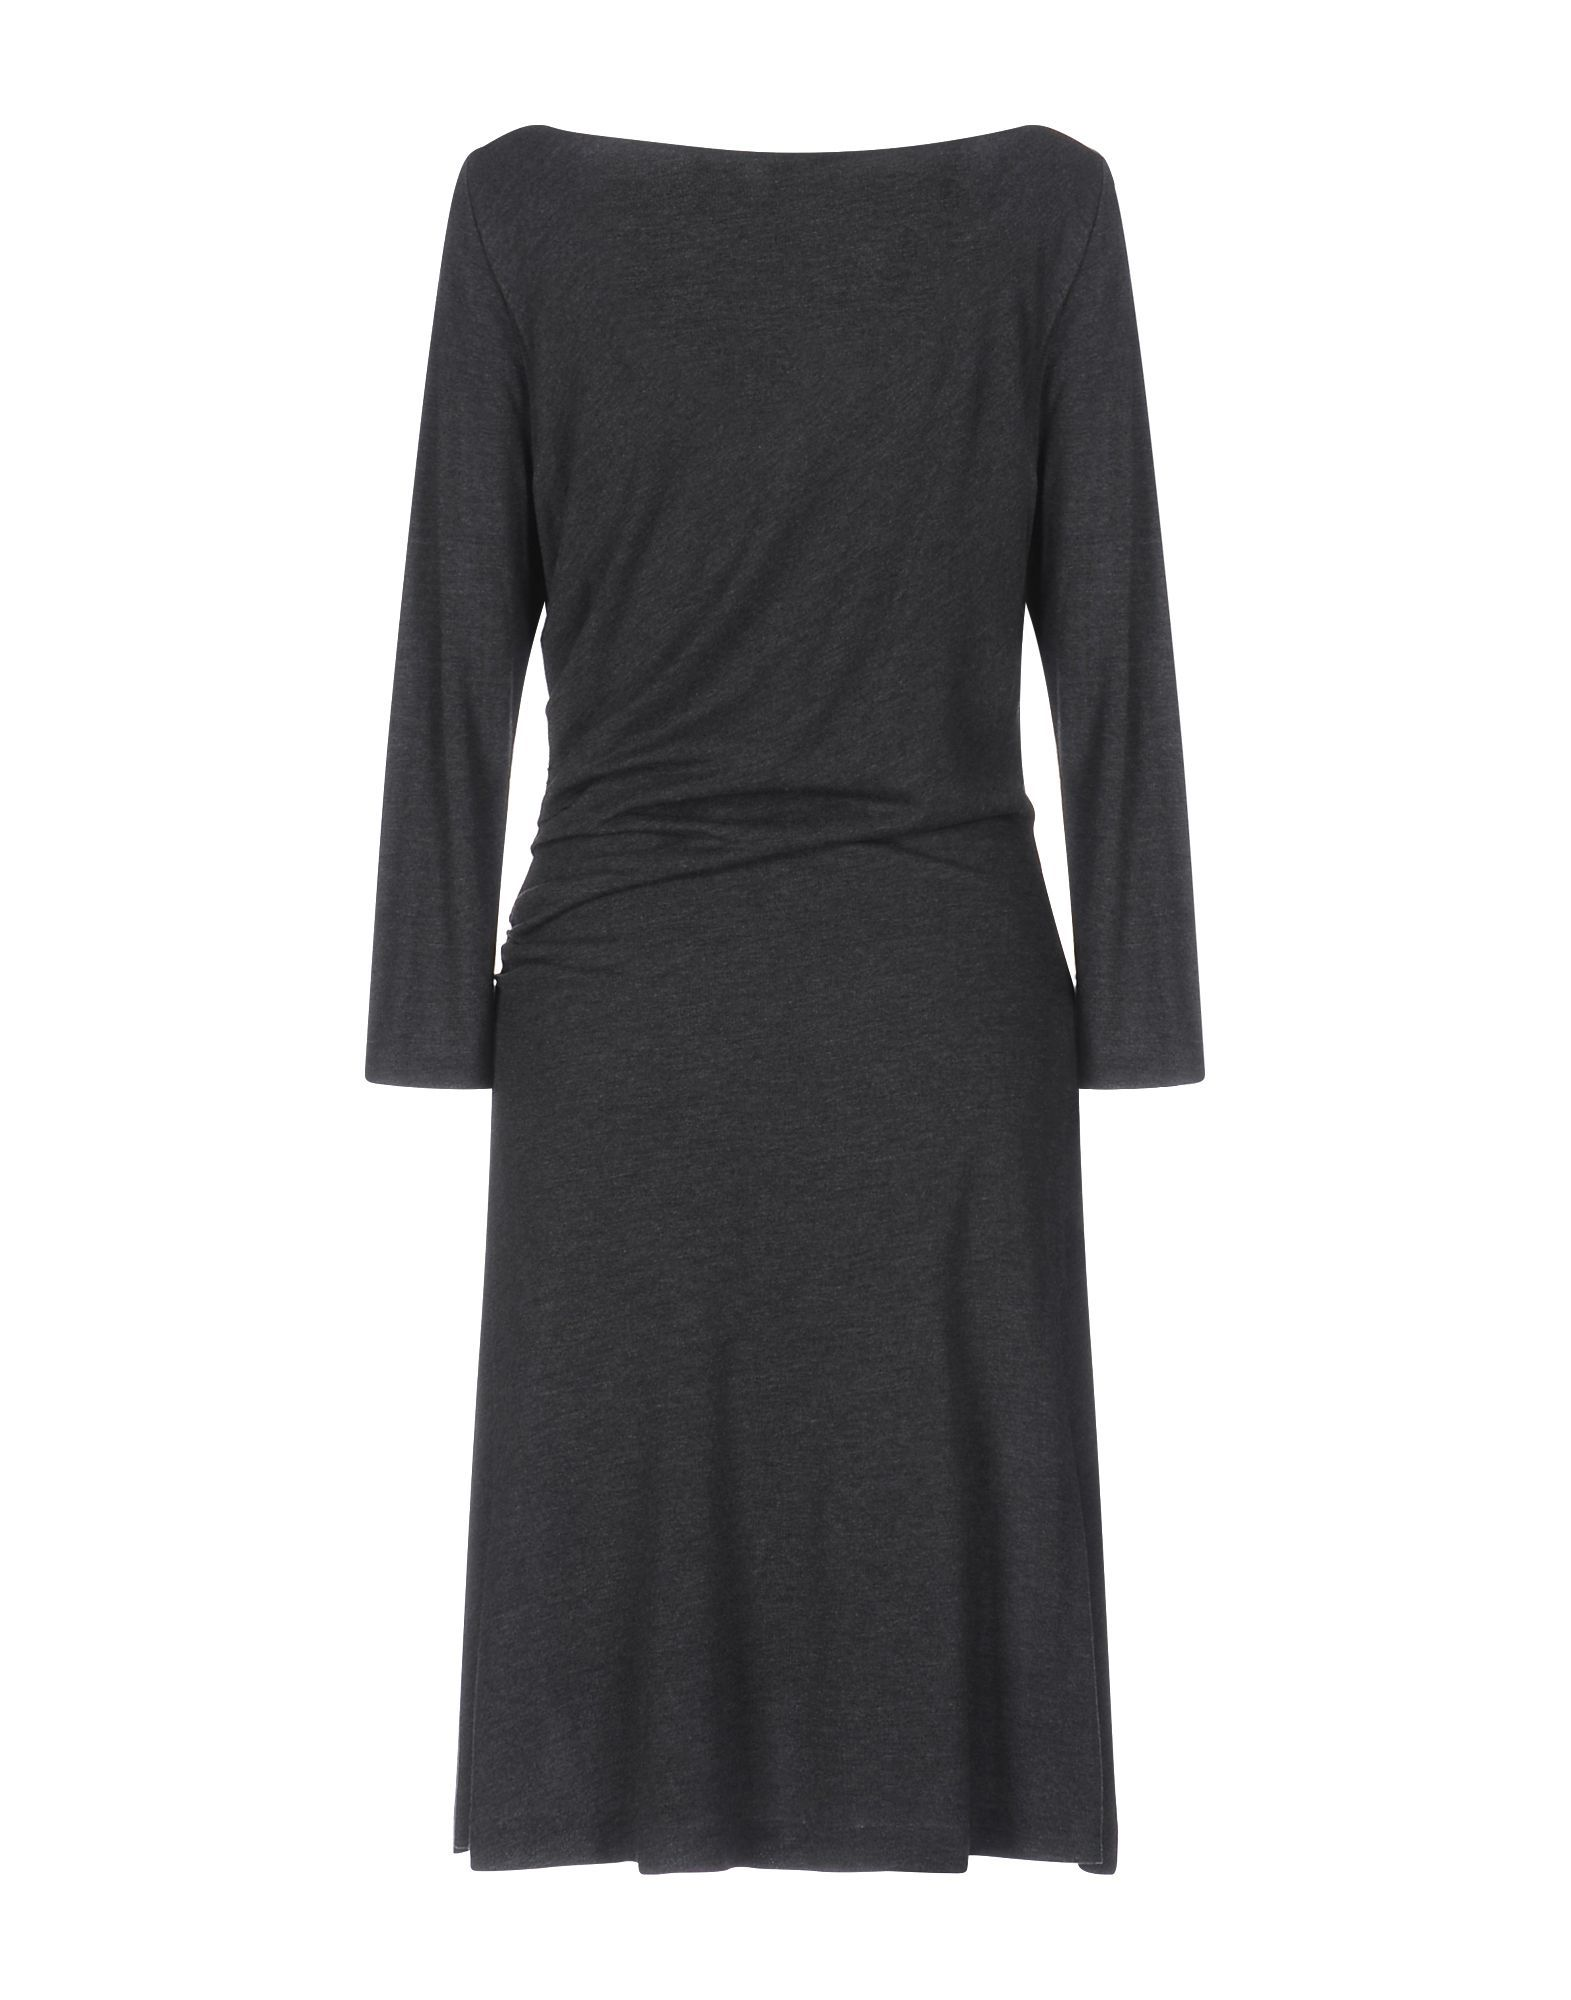 Diane Von Furstenberg Lead Modal Long Sleeve Dress